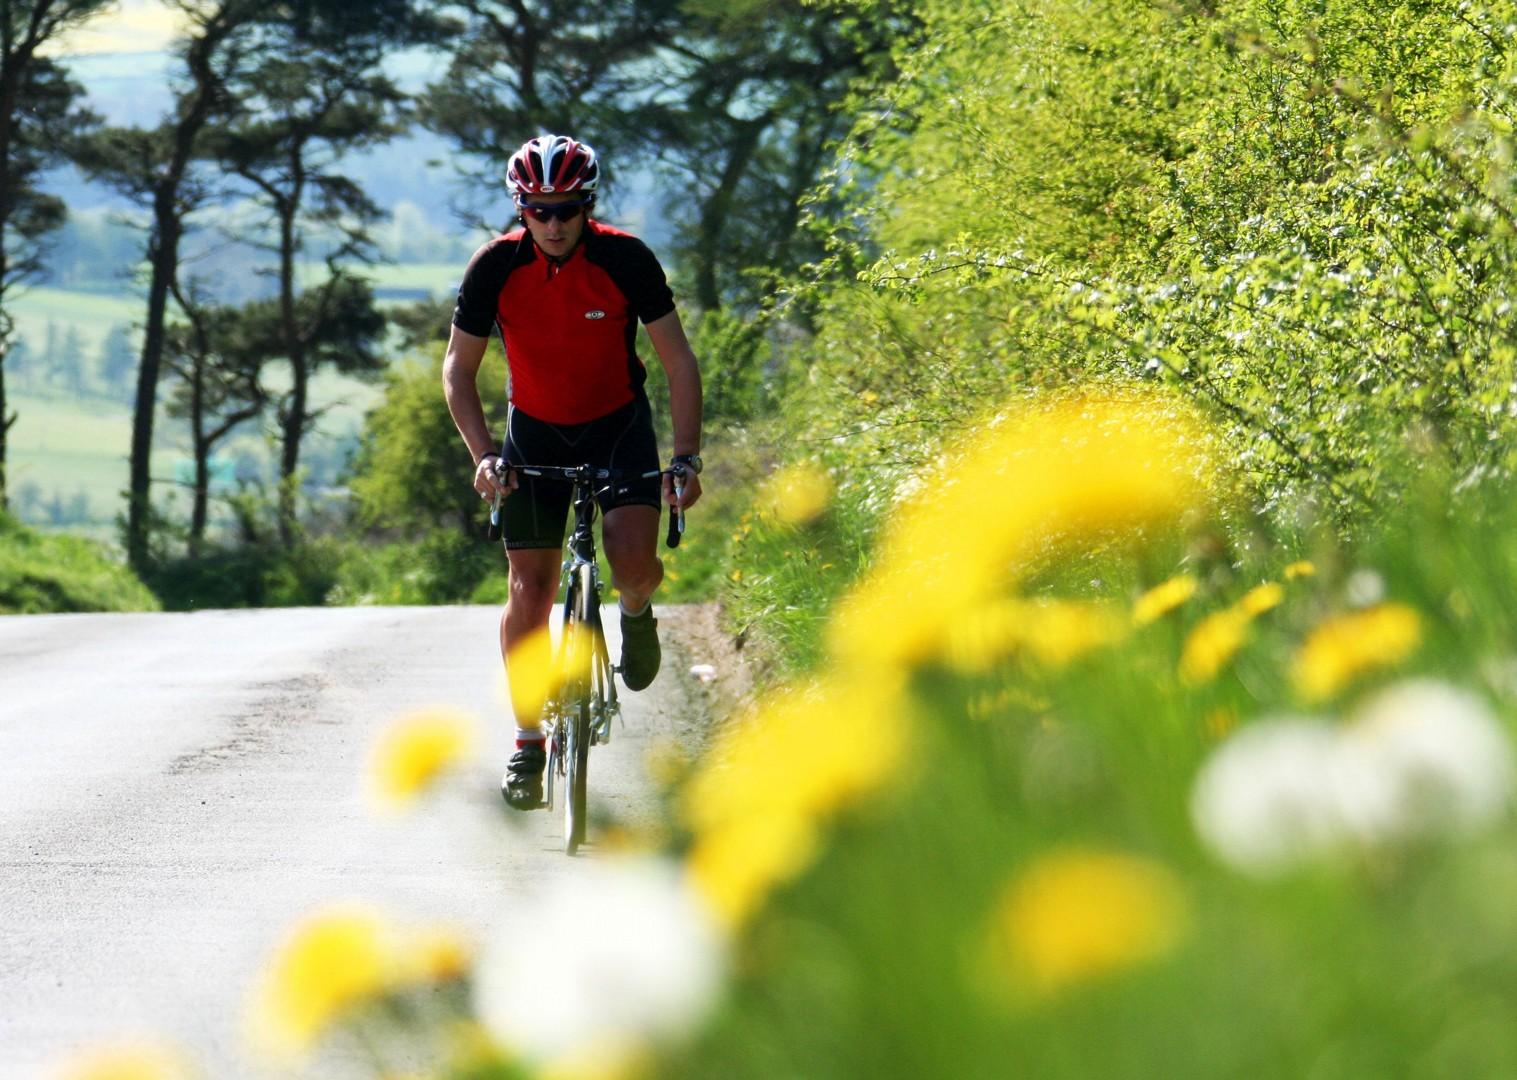 road-cycling-weekend-uk.jpg - UK - Northumberland - Road Cycling